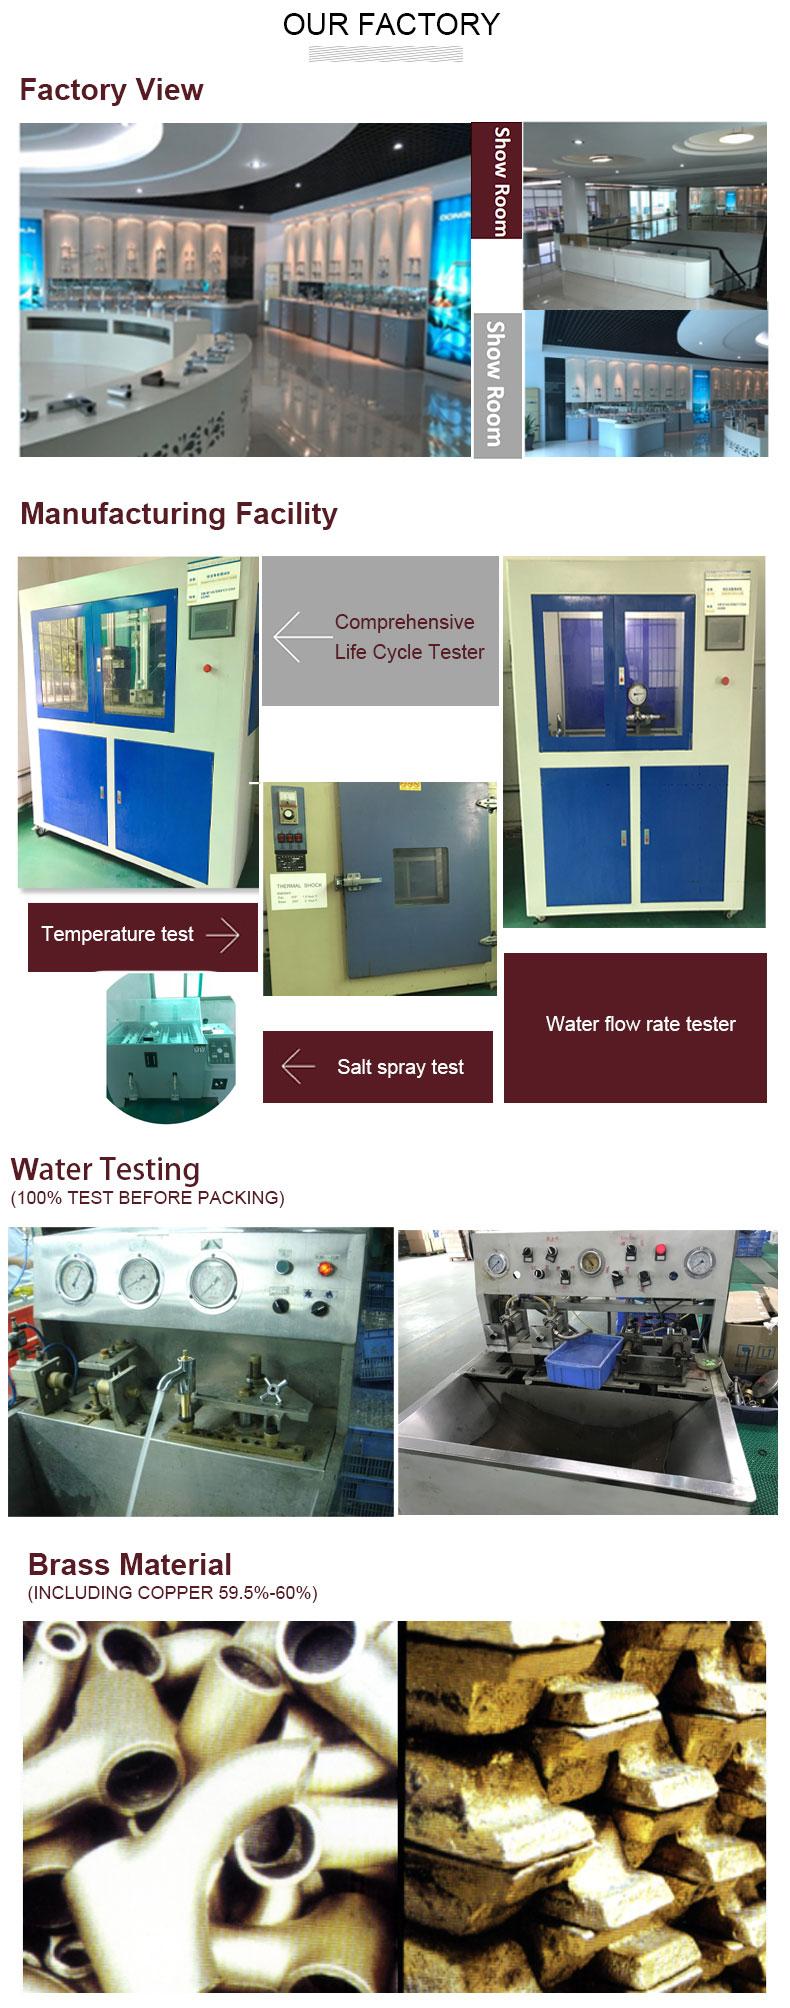 Single Level Bath Mixer manufacturers